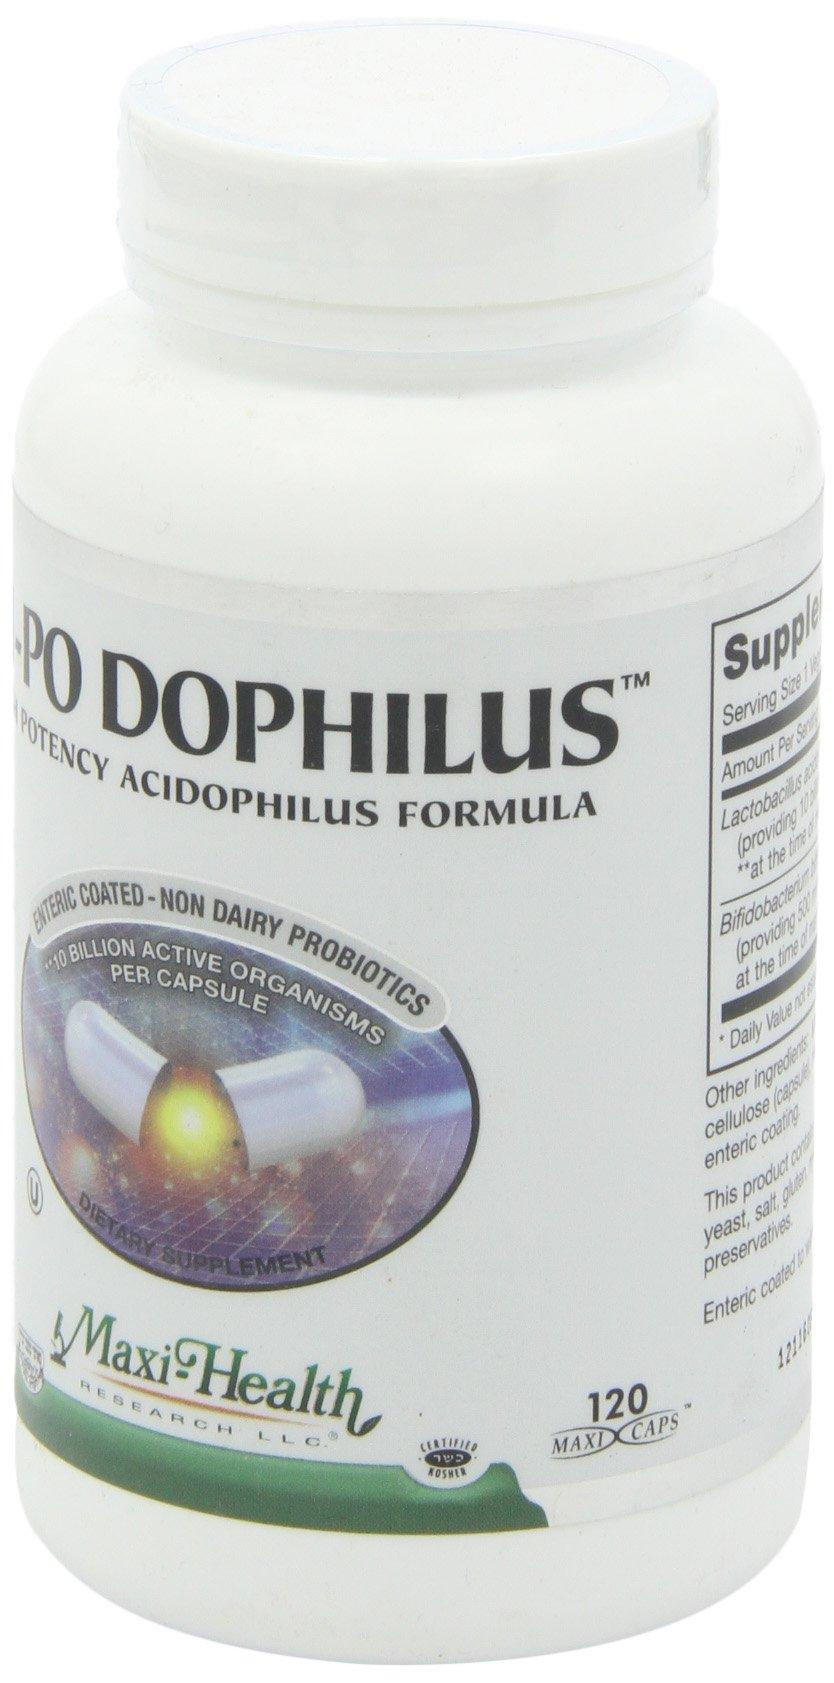 Maxi Health HI-PO Dophilus High Potency Acidophilus Probiotics, 120 Count by Maxi Health (Image #6)